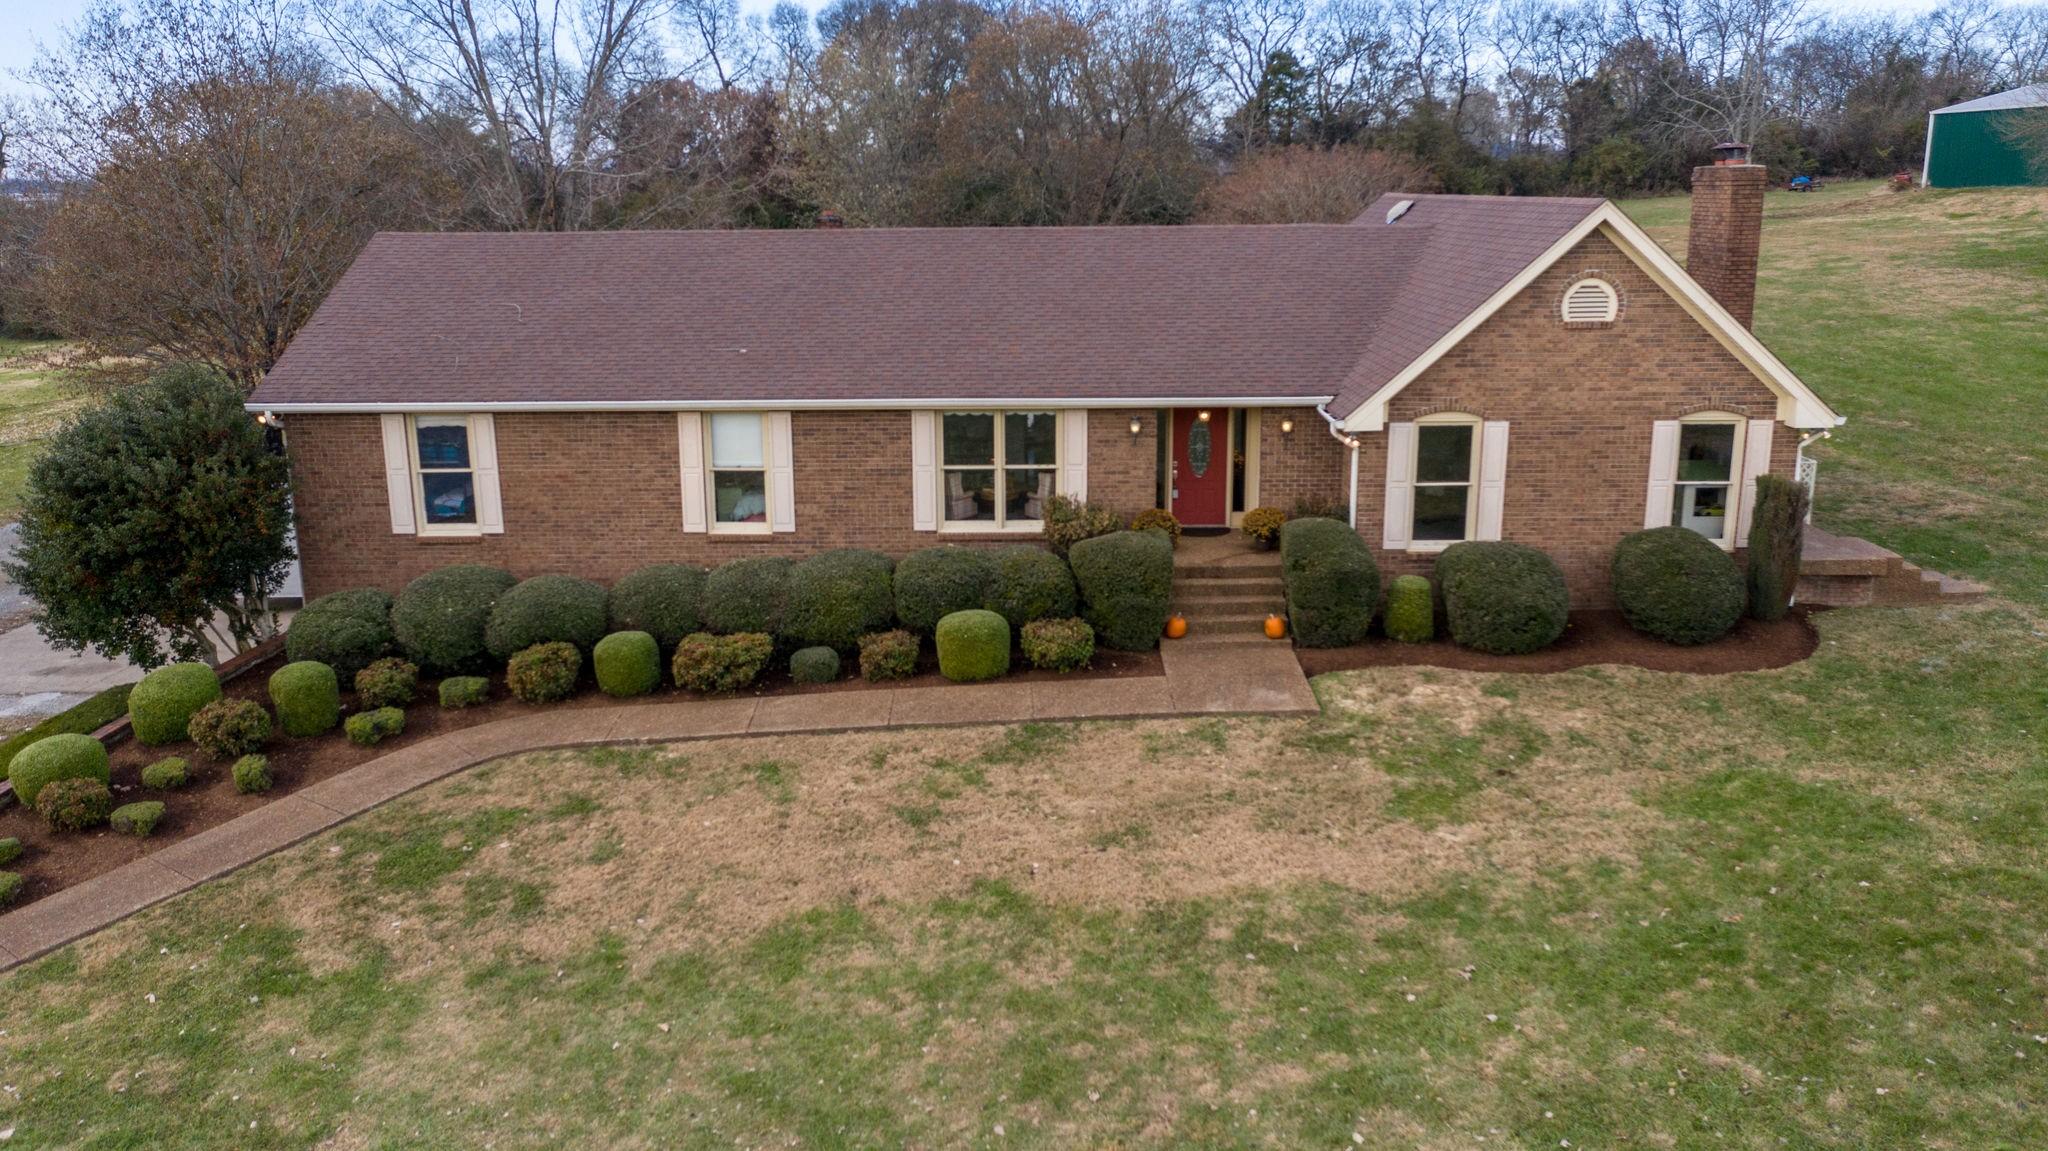 1020 Robertson Rd, Gallatin, TN 37066 - Gallatin, TN real estate listing